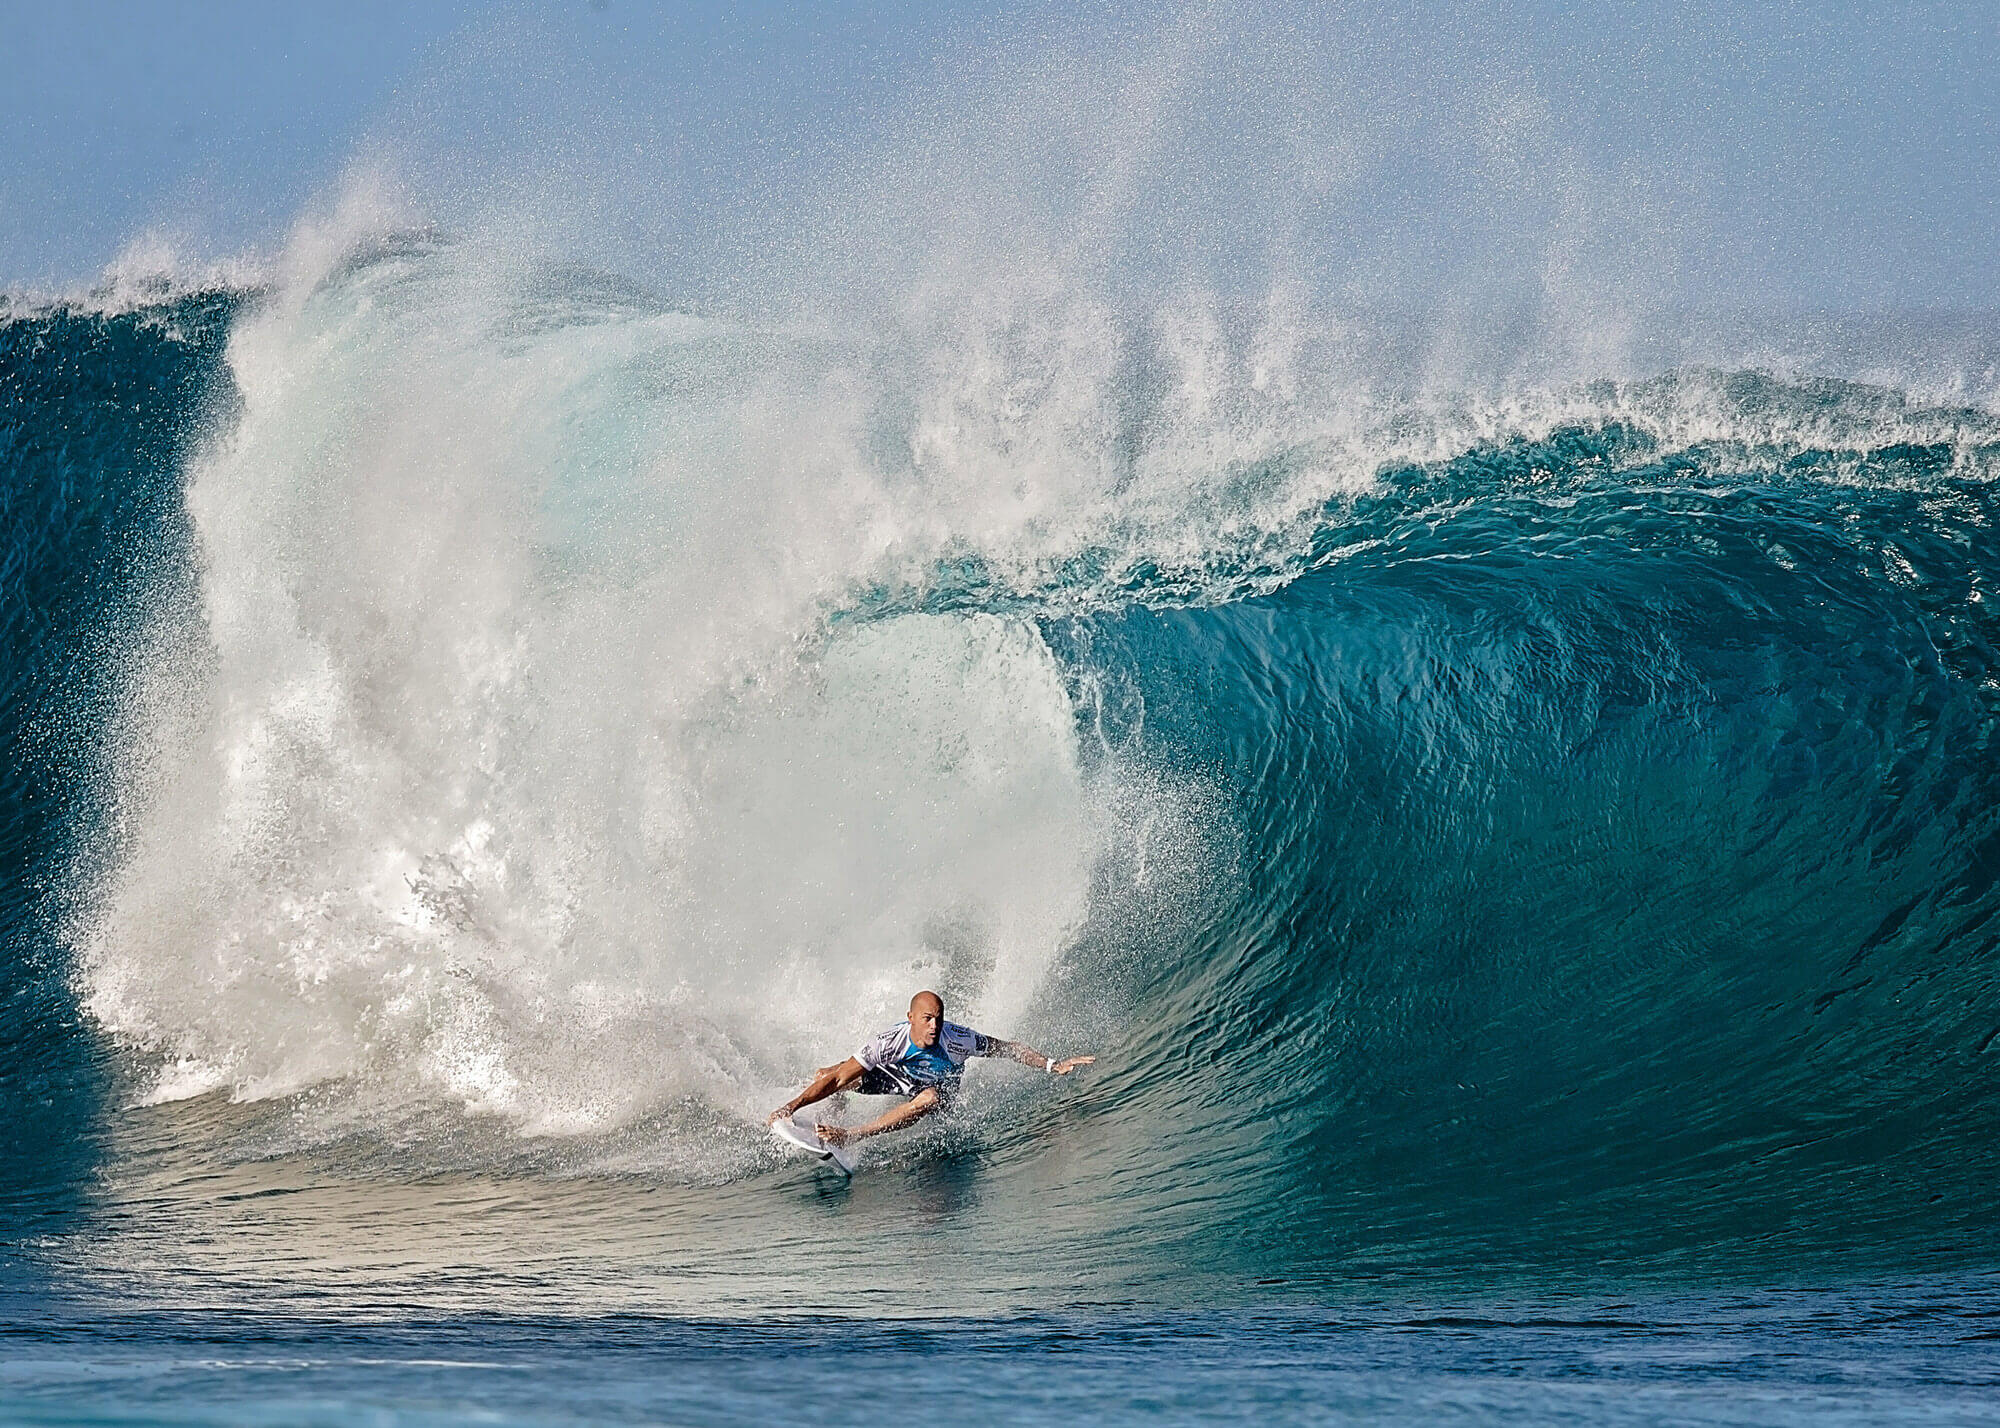 Man on surfboard on big wave